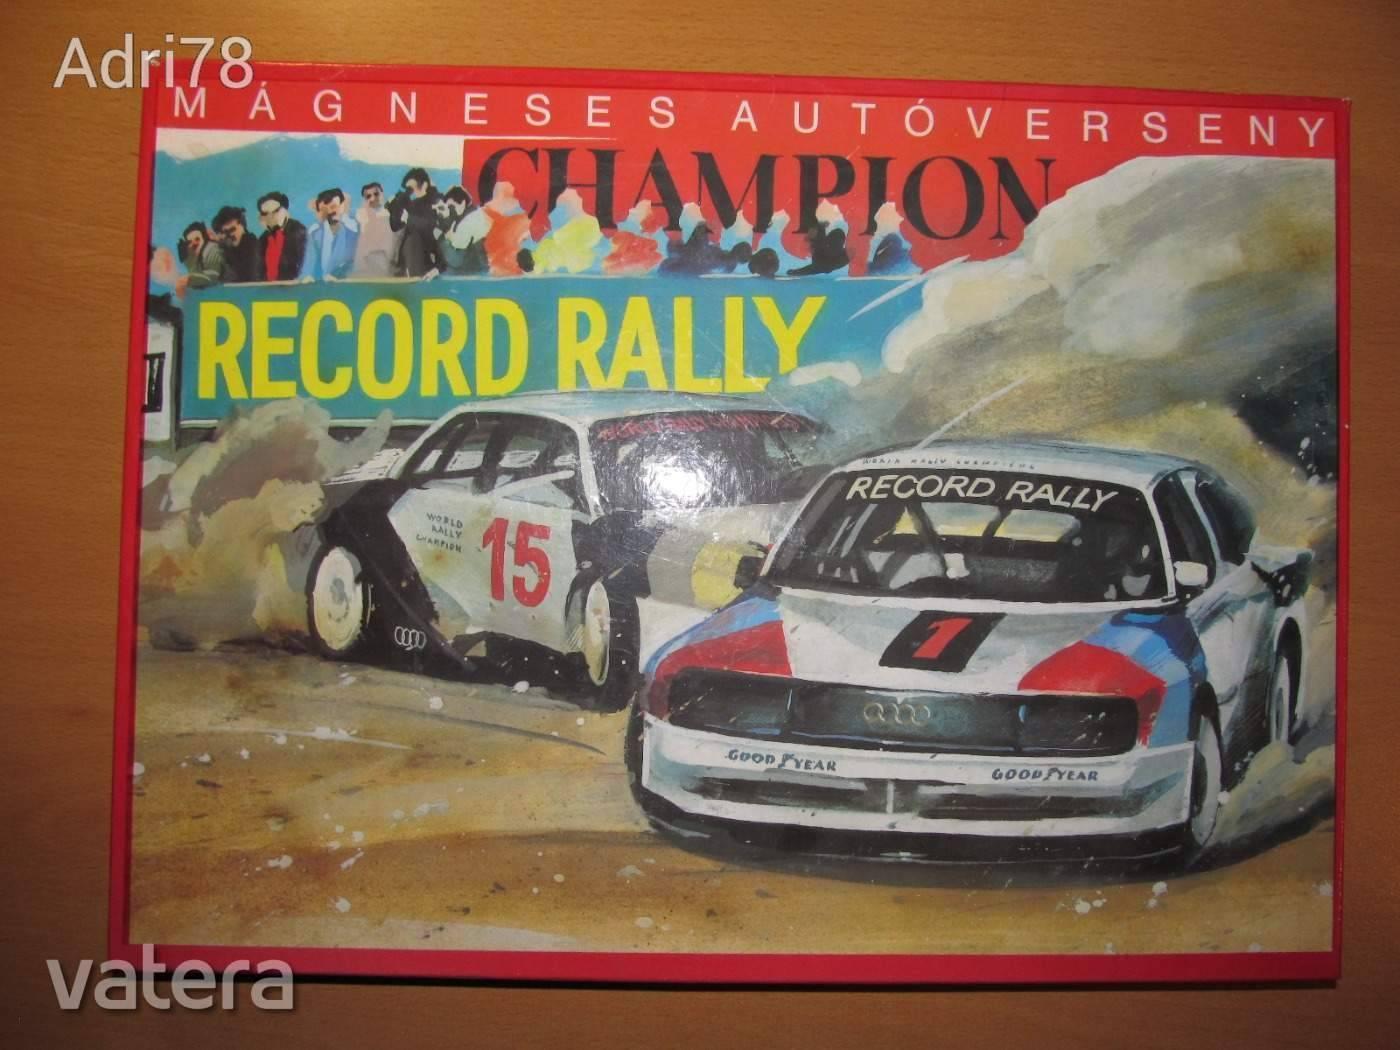 regi-retro-tarsasjatek-magneses-autoverseny-record-rally-trial-record-1980-as-evek-722b_1_big.jpg